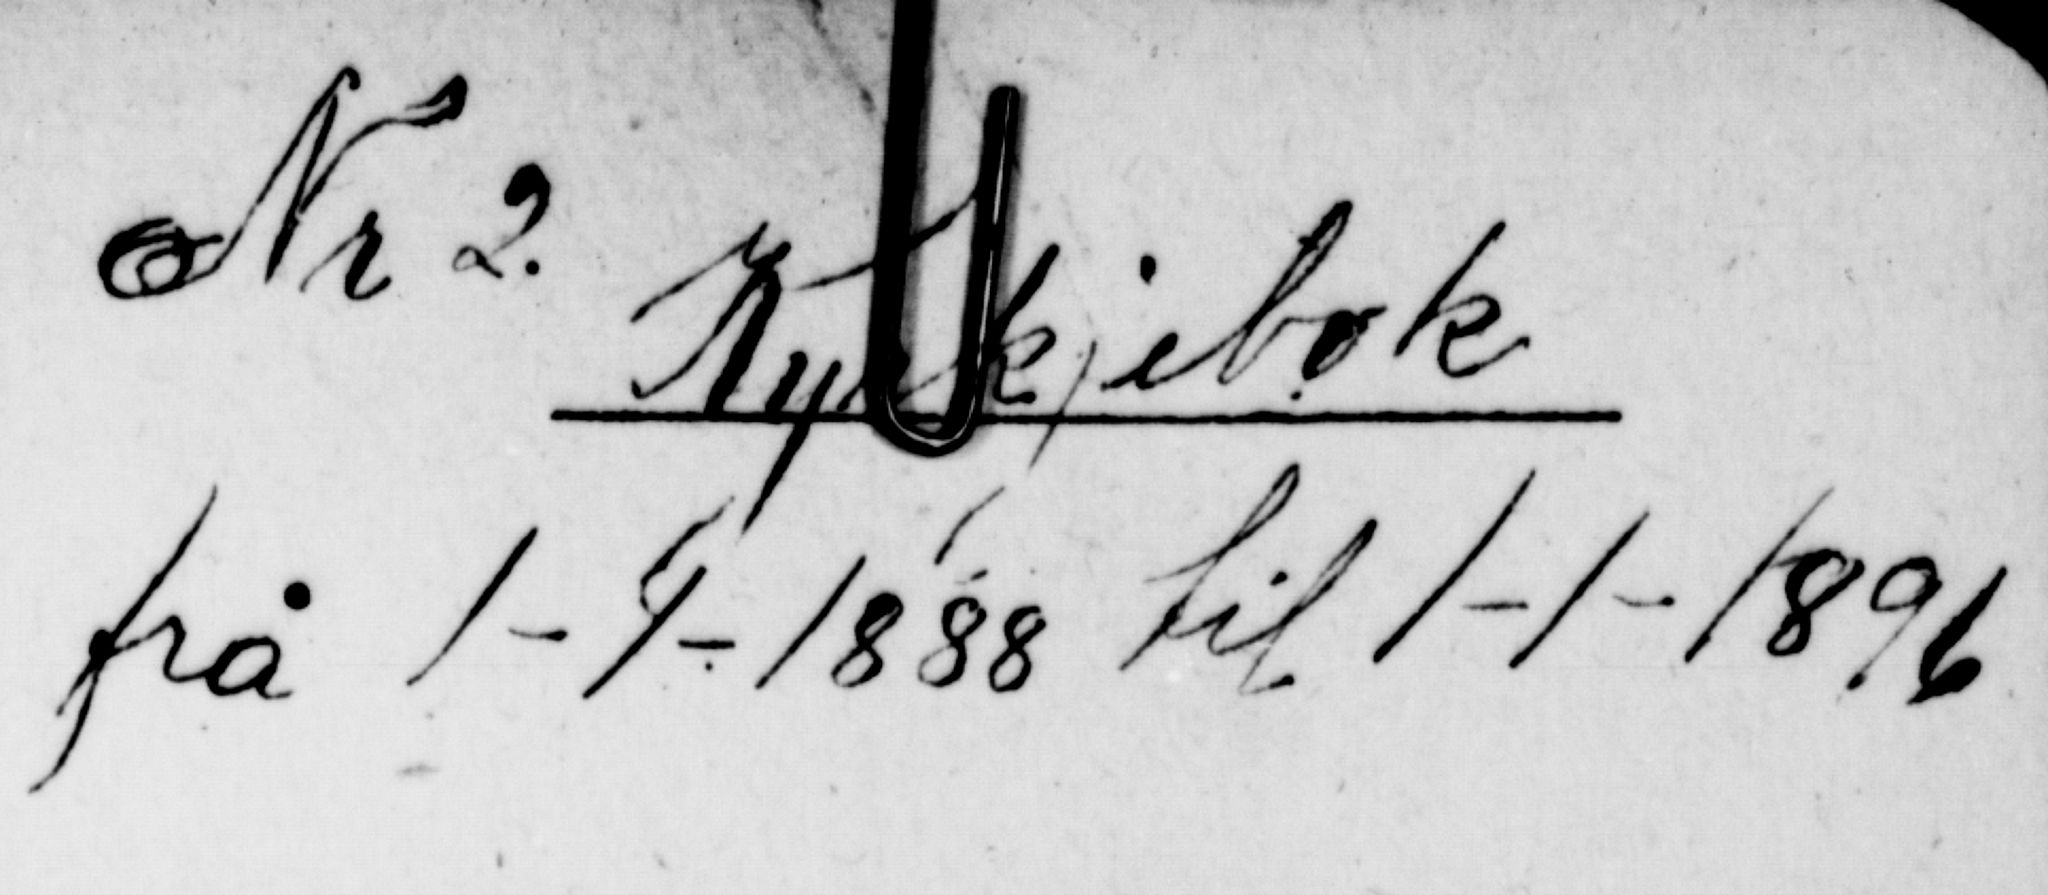 SAKO, Lunde kirkebøker, G/Gb/L0002: Klokkerbok nr. II 2, 1888-1895